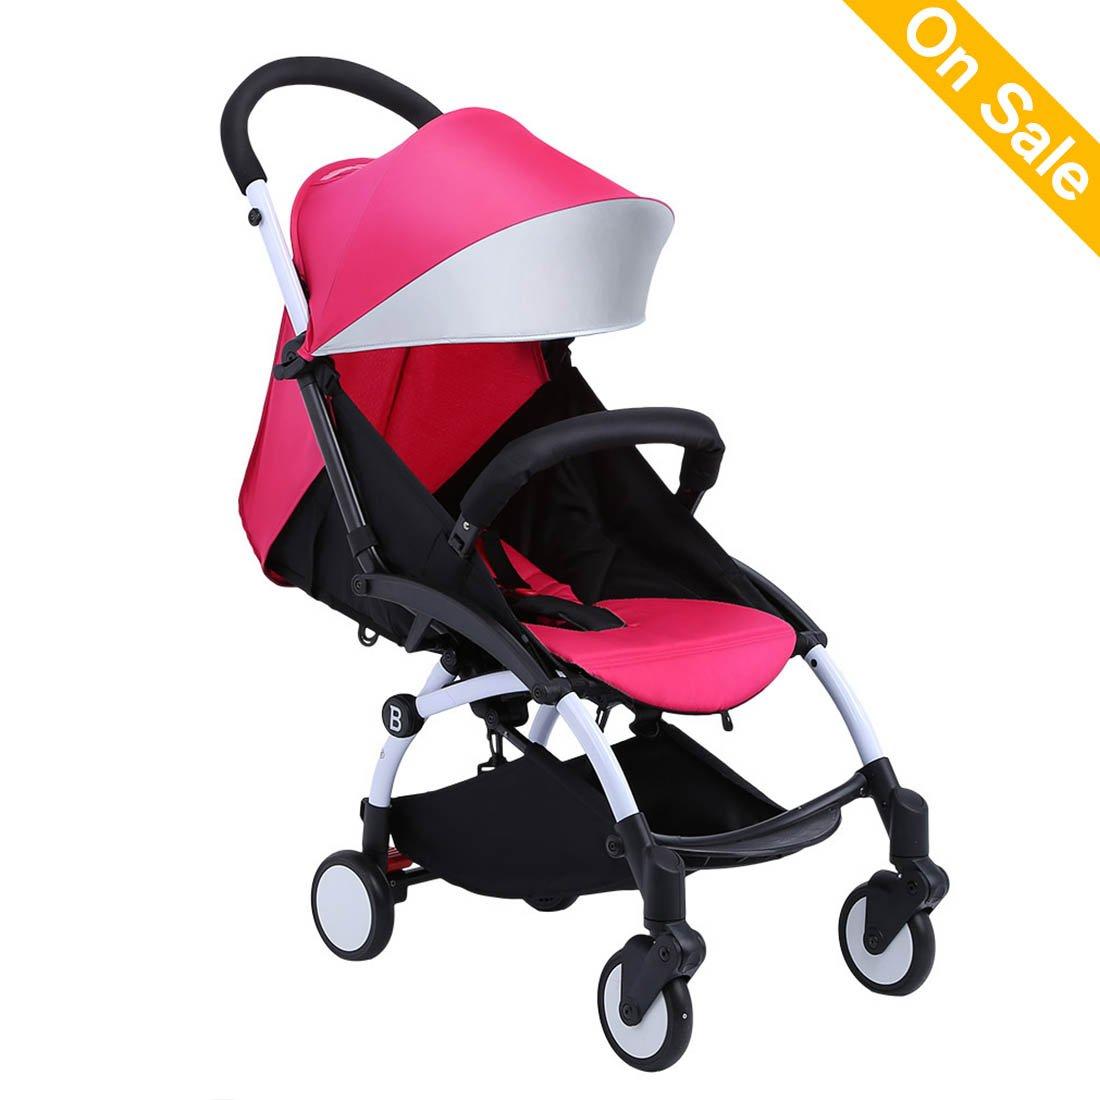 Baabyoo Ultra lightweight Baby Stroller Folding Infant Stroller Travel System Anti-Shock Umbrella Stroller 12.8lb Rainproof Toddler Carrier for Travel and Plane Rosyred